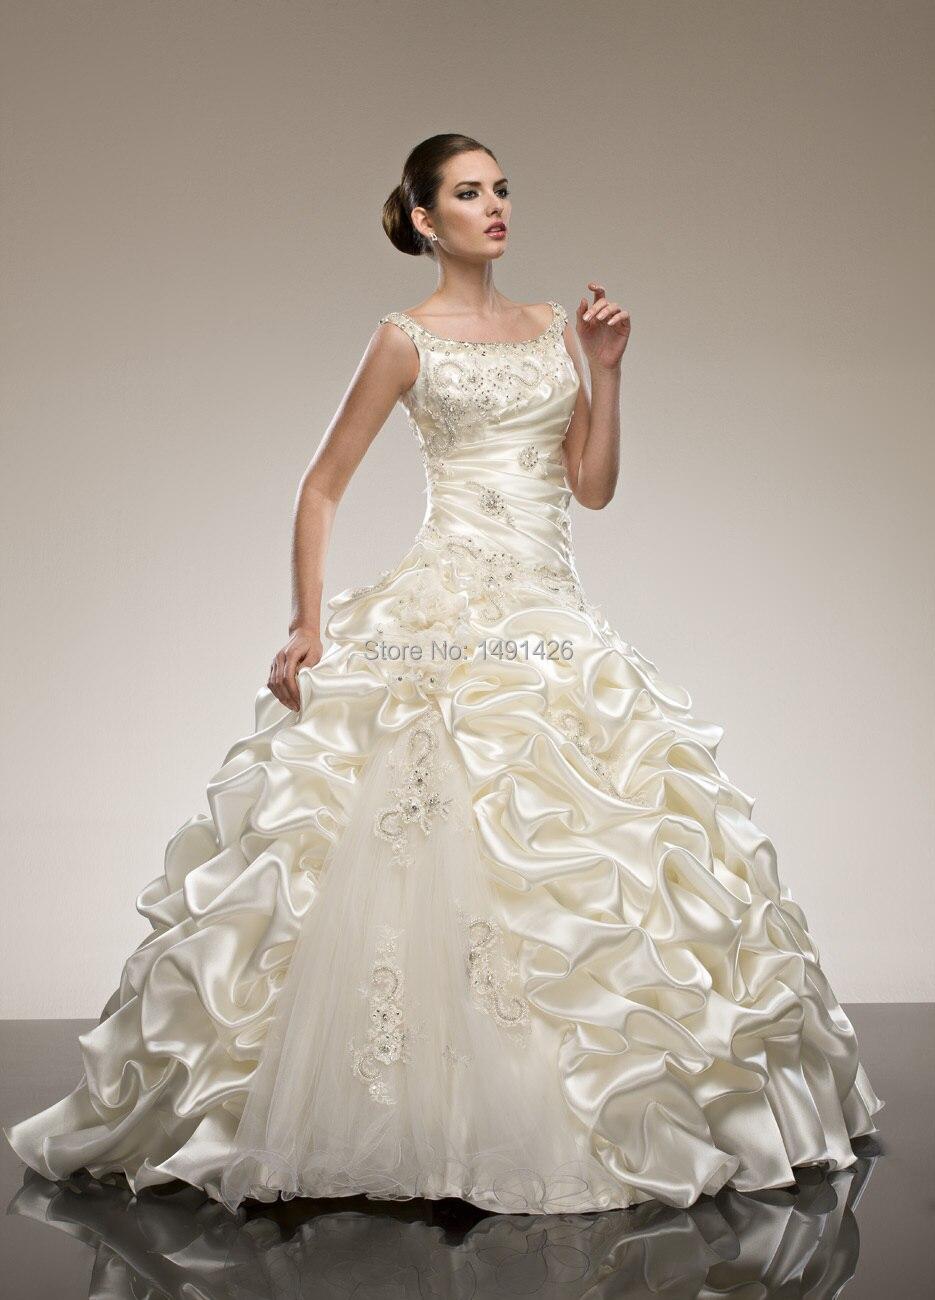 Luxurious Silk Taffeta With Scarf For Saudi Arabia Abaya Ball Gown ...